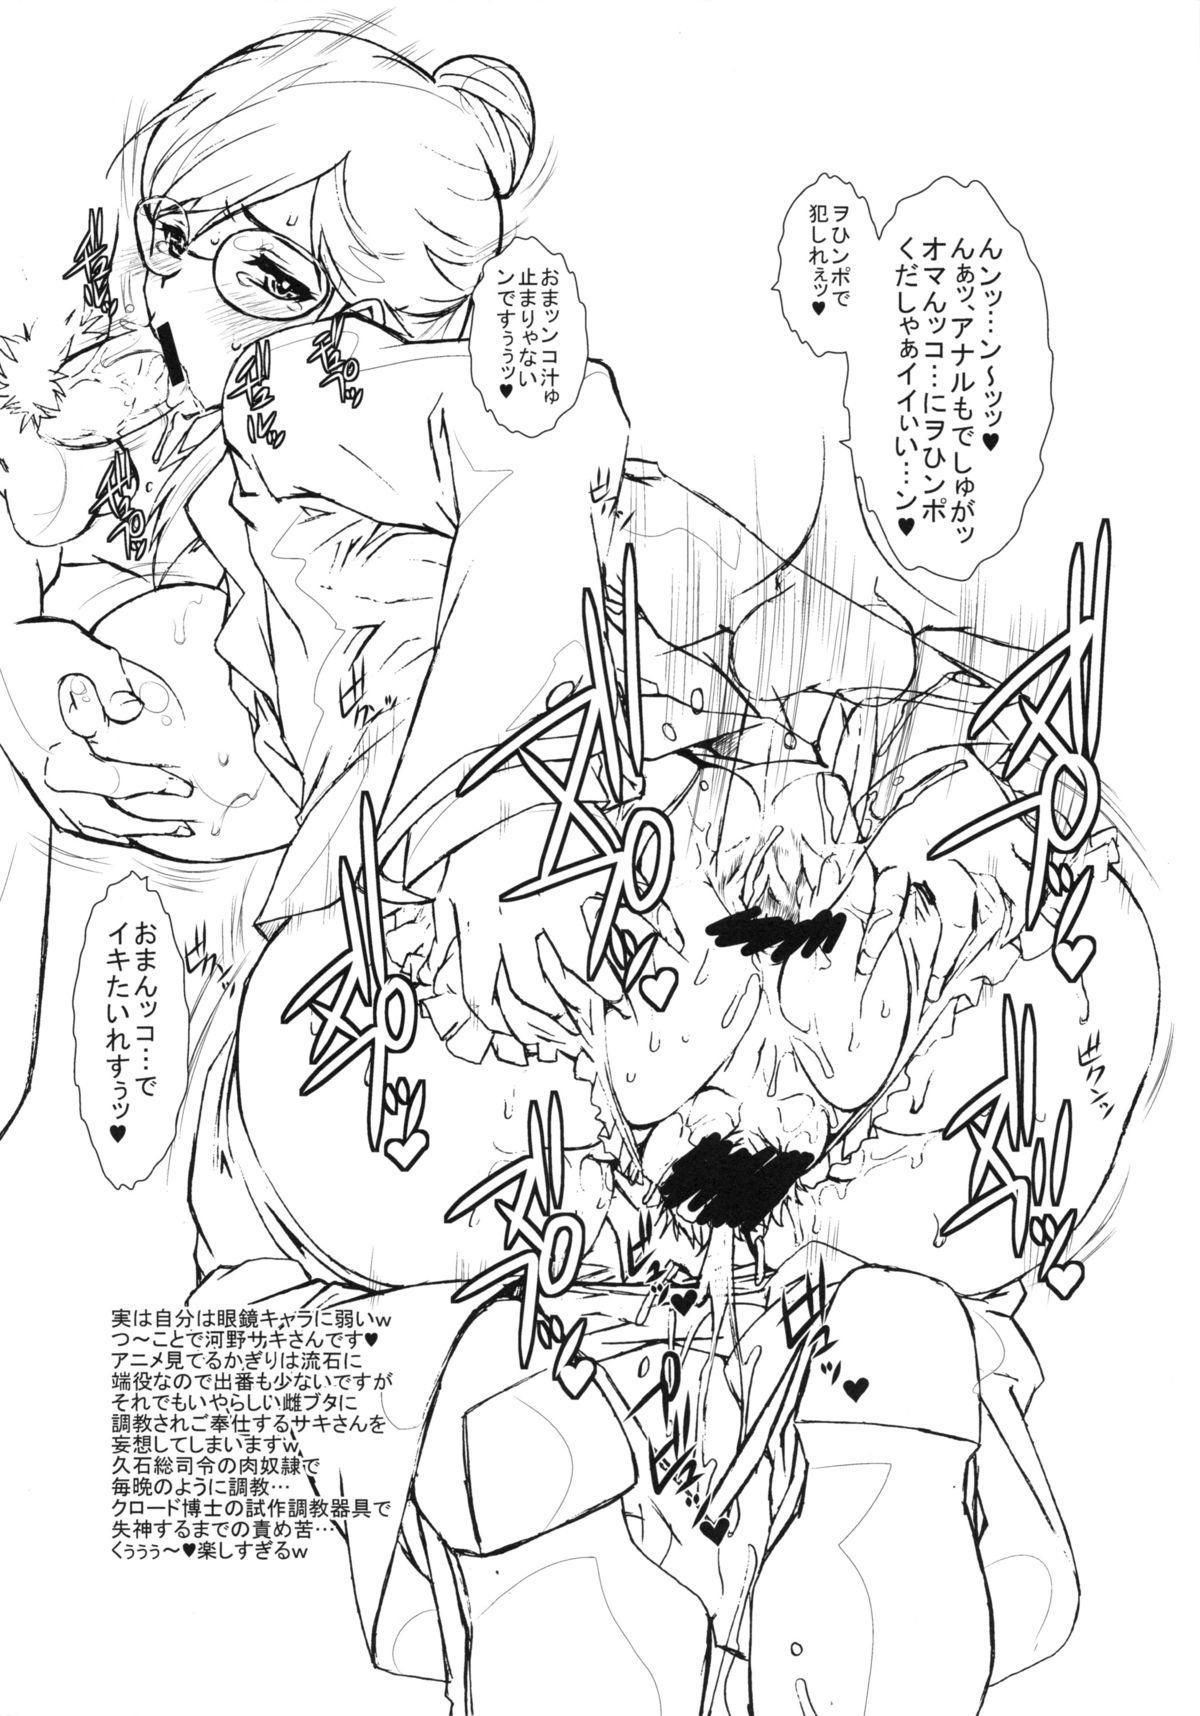 Zetubou Teki Sensei 14